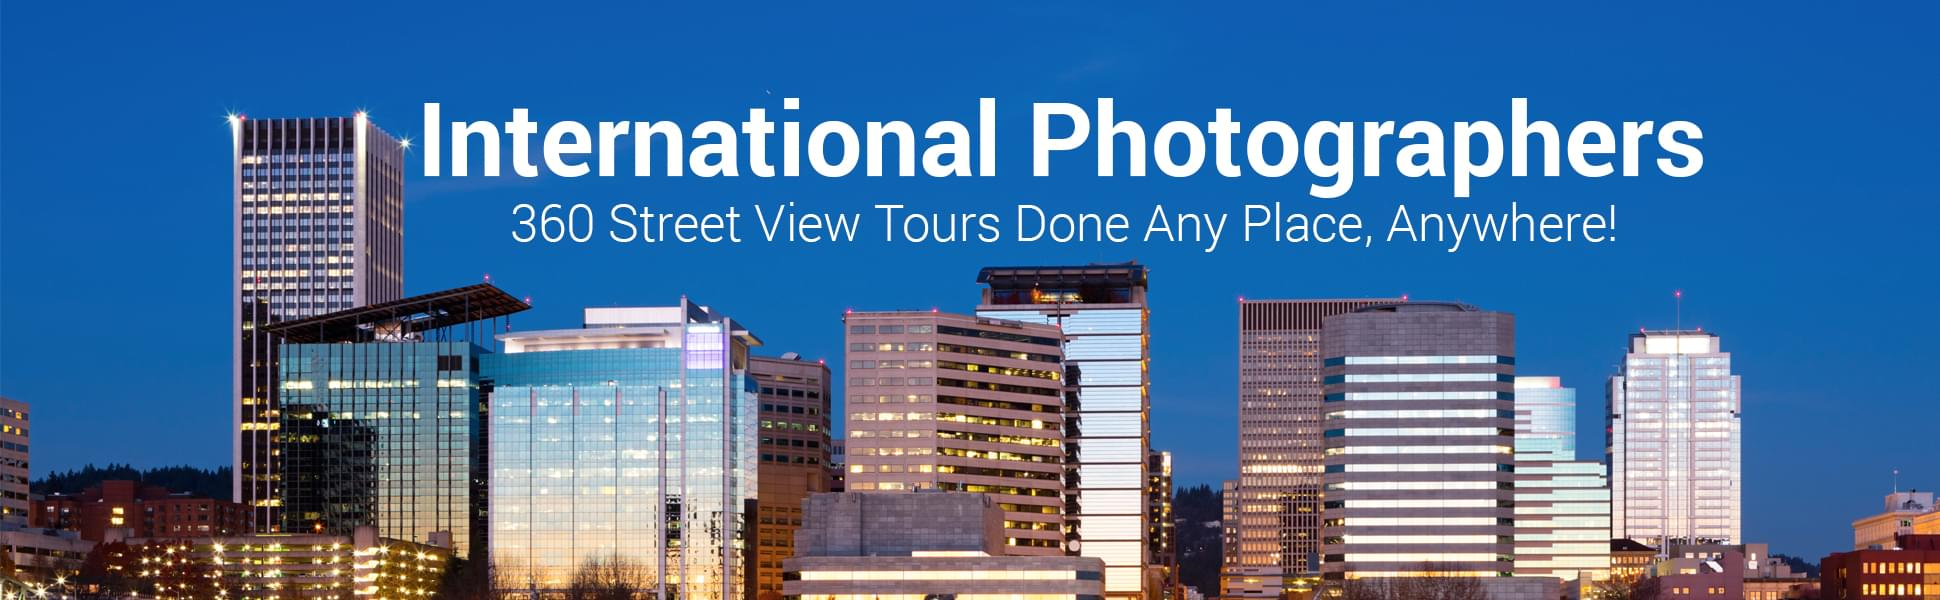 GoogleBusinessViewInternationalPhotographers